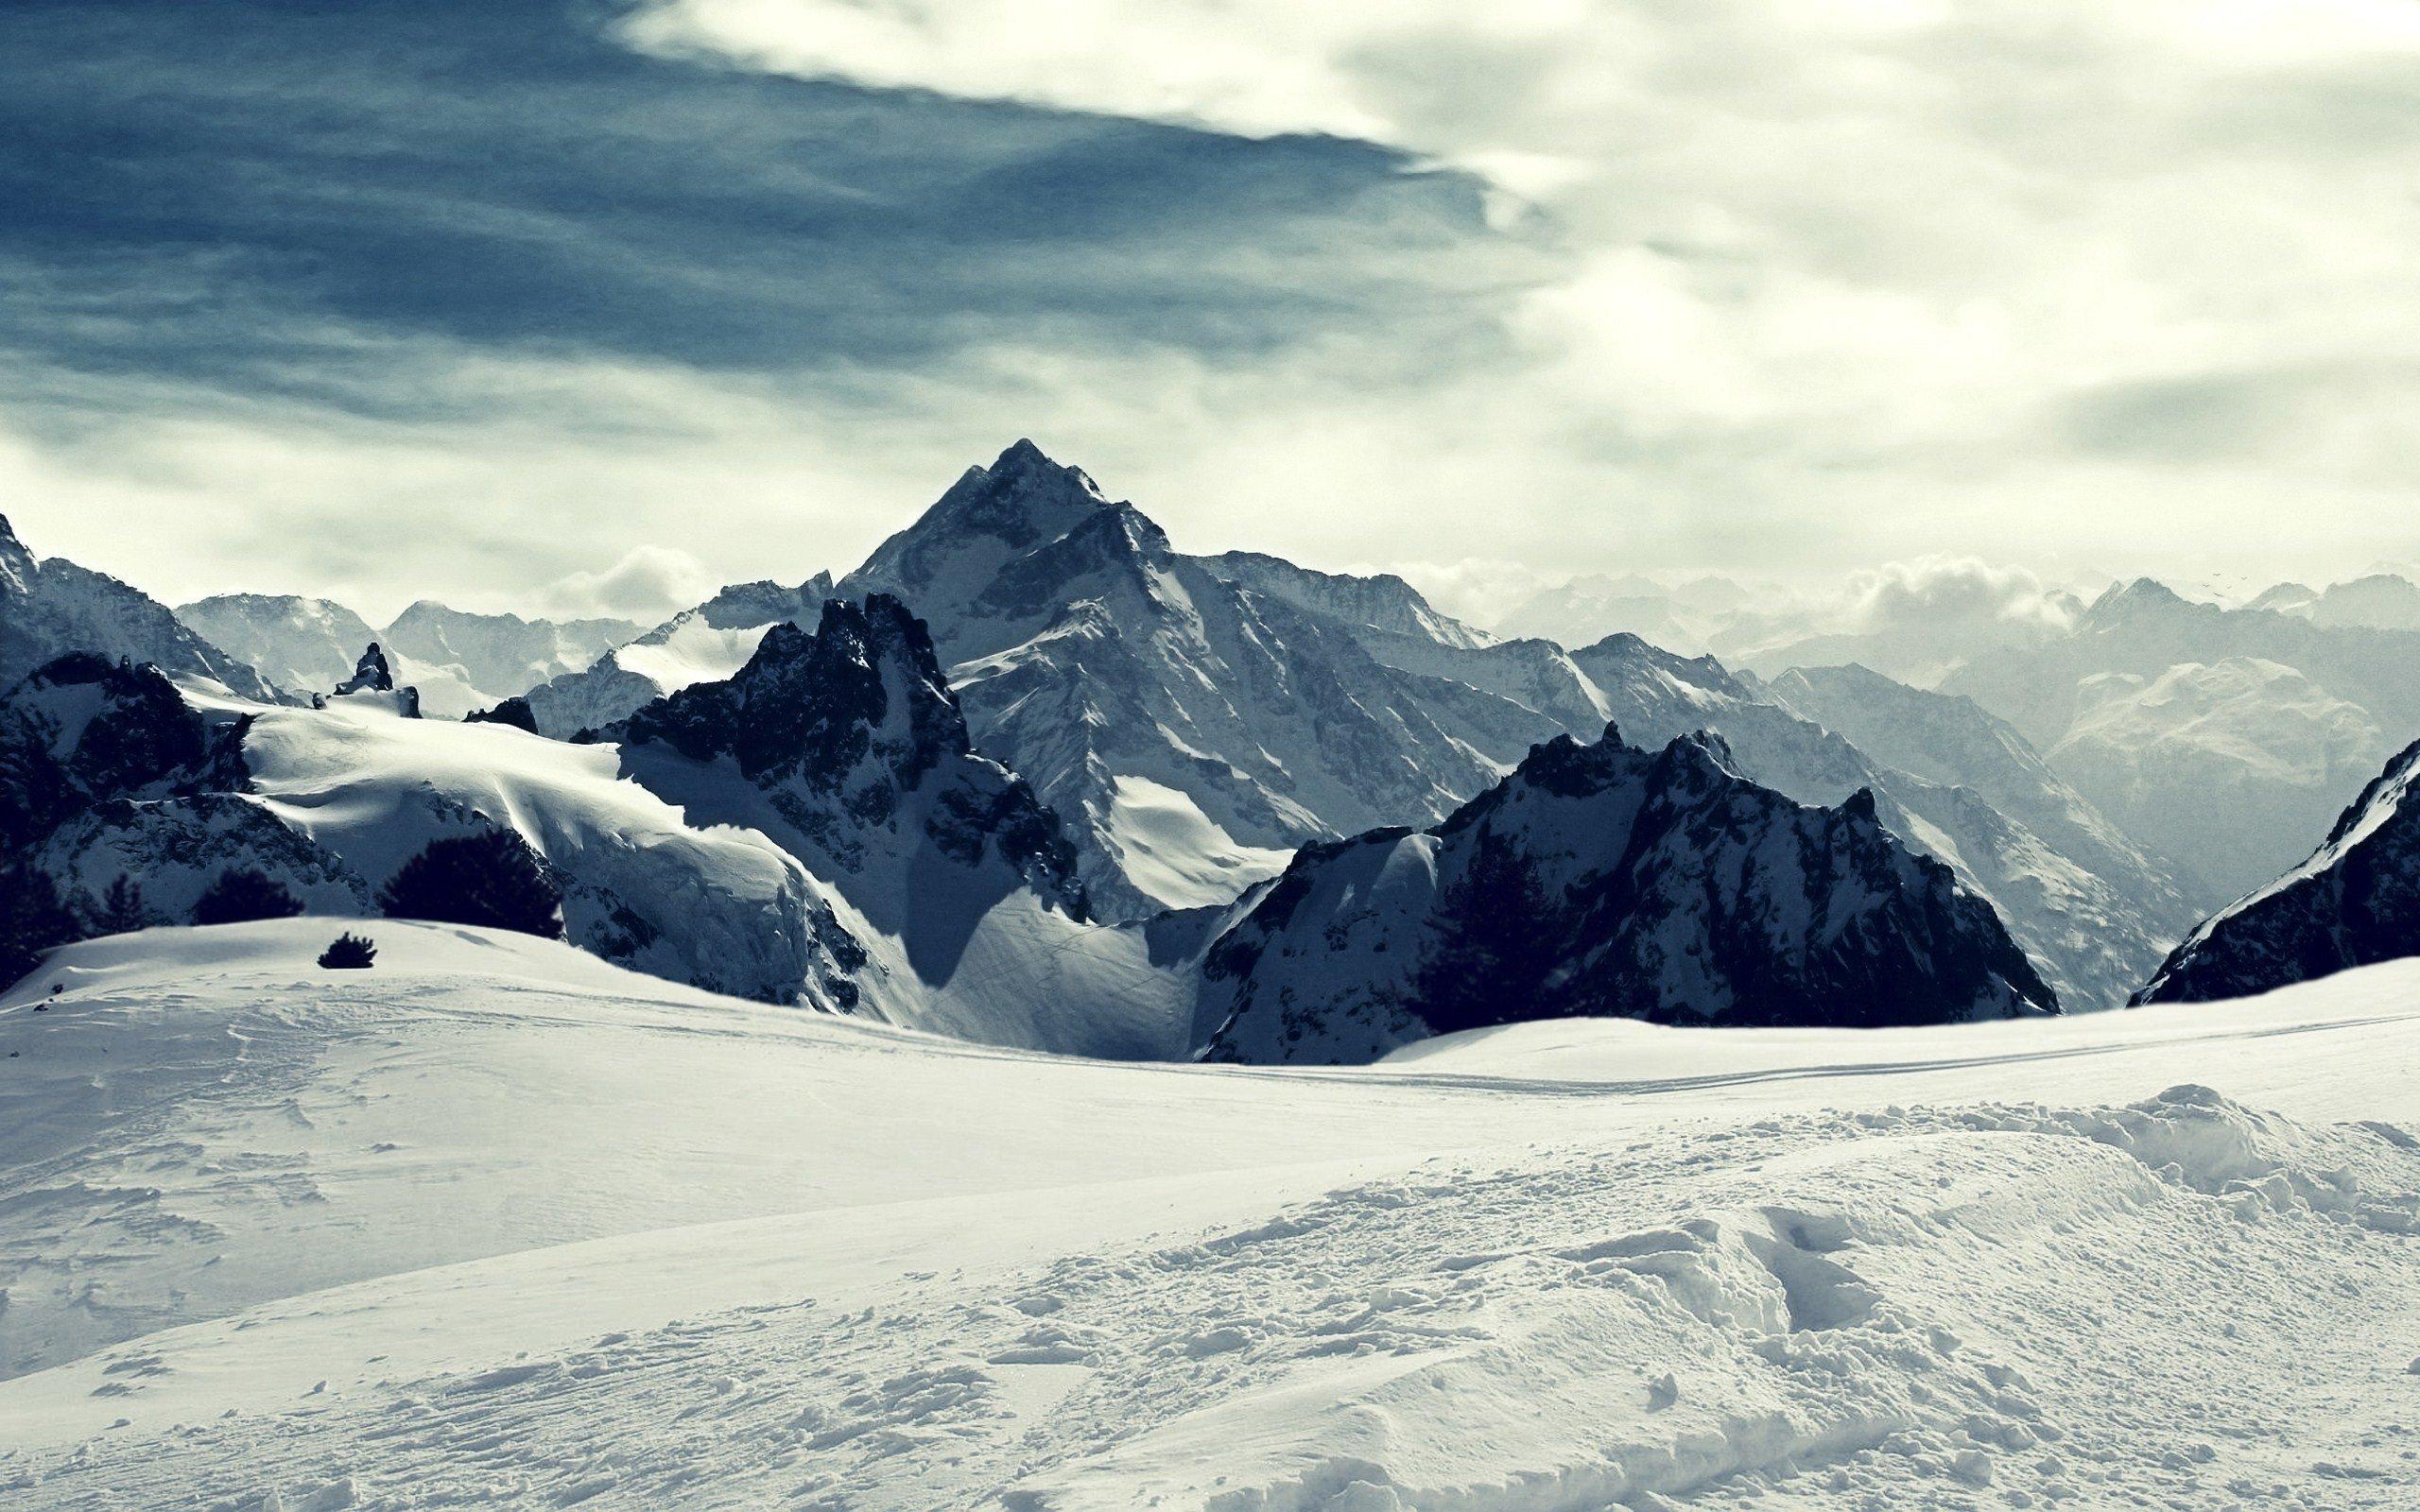 iceland-mountain-snow.jpg